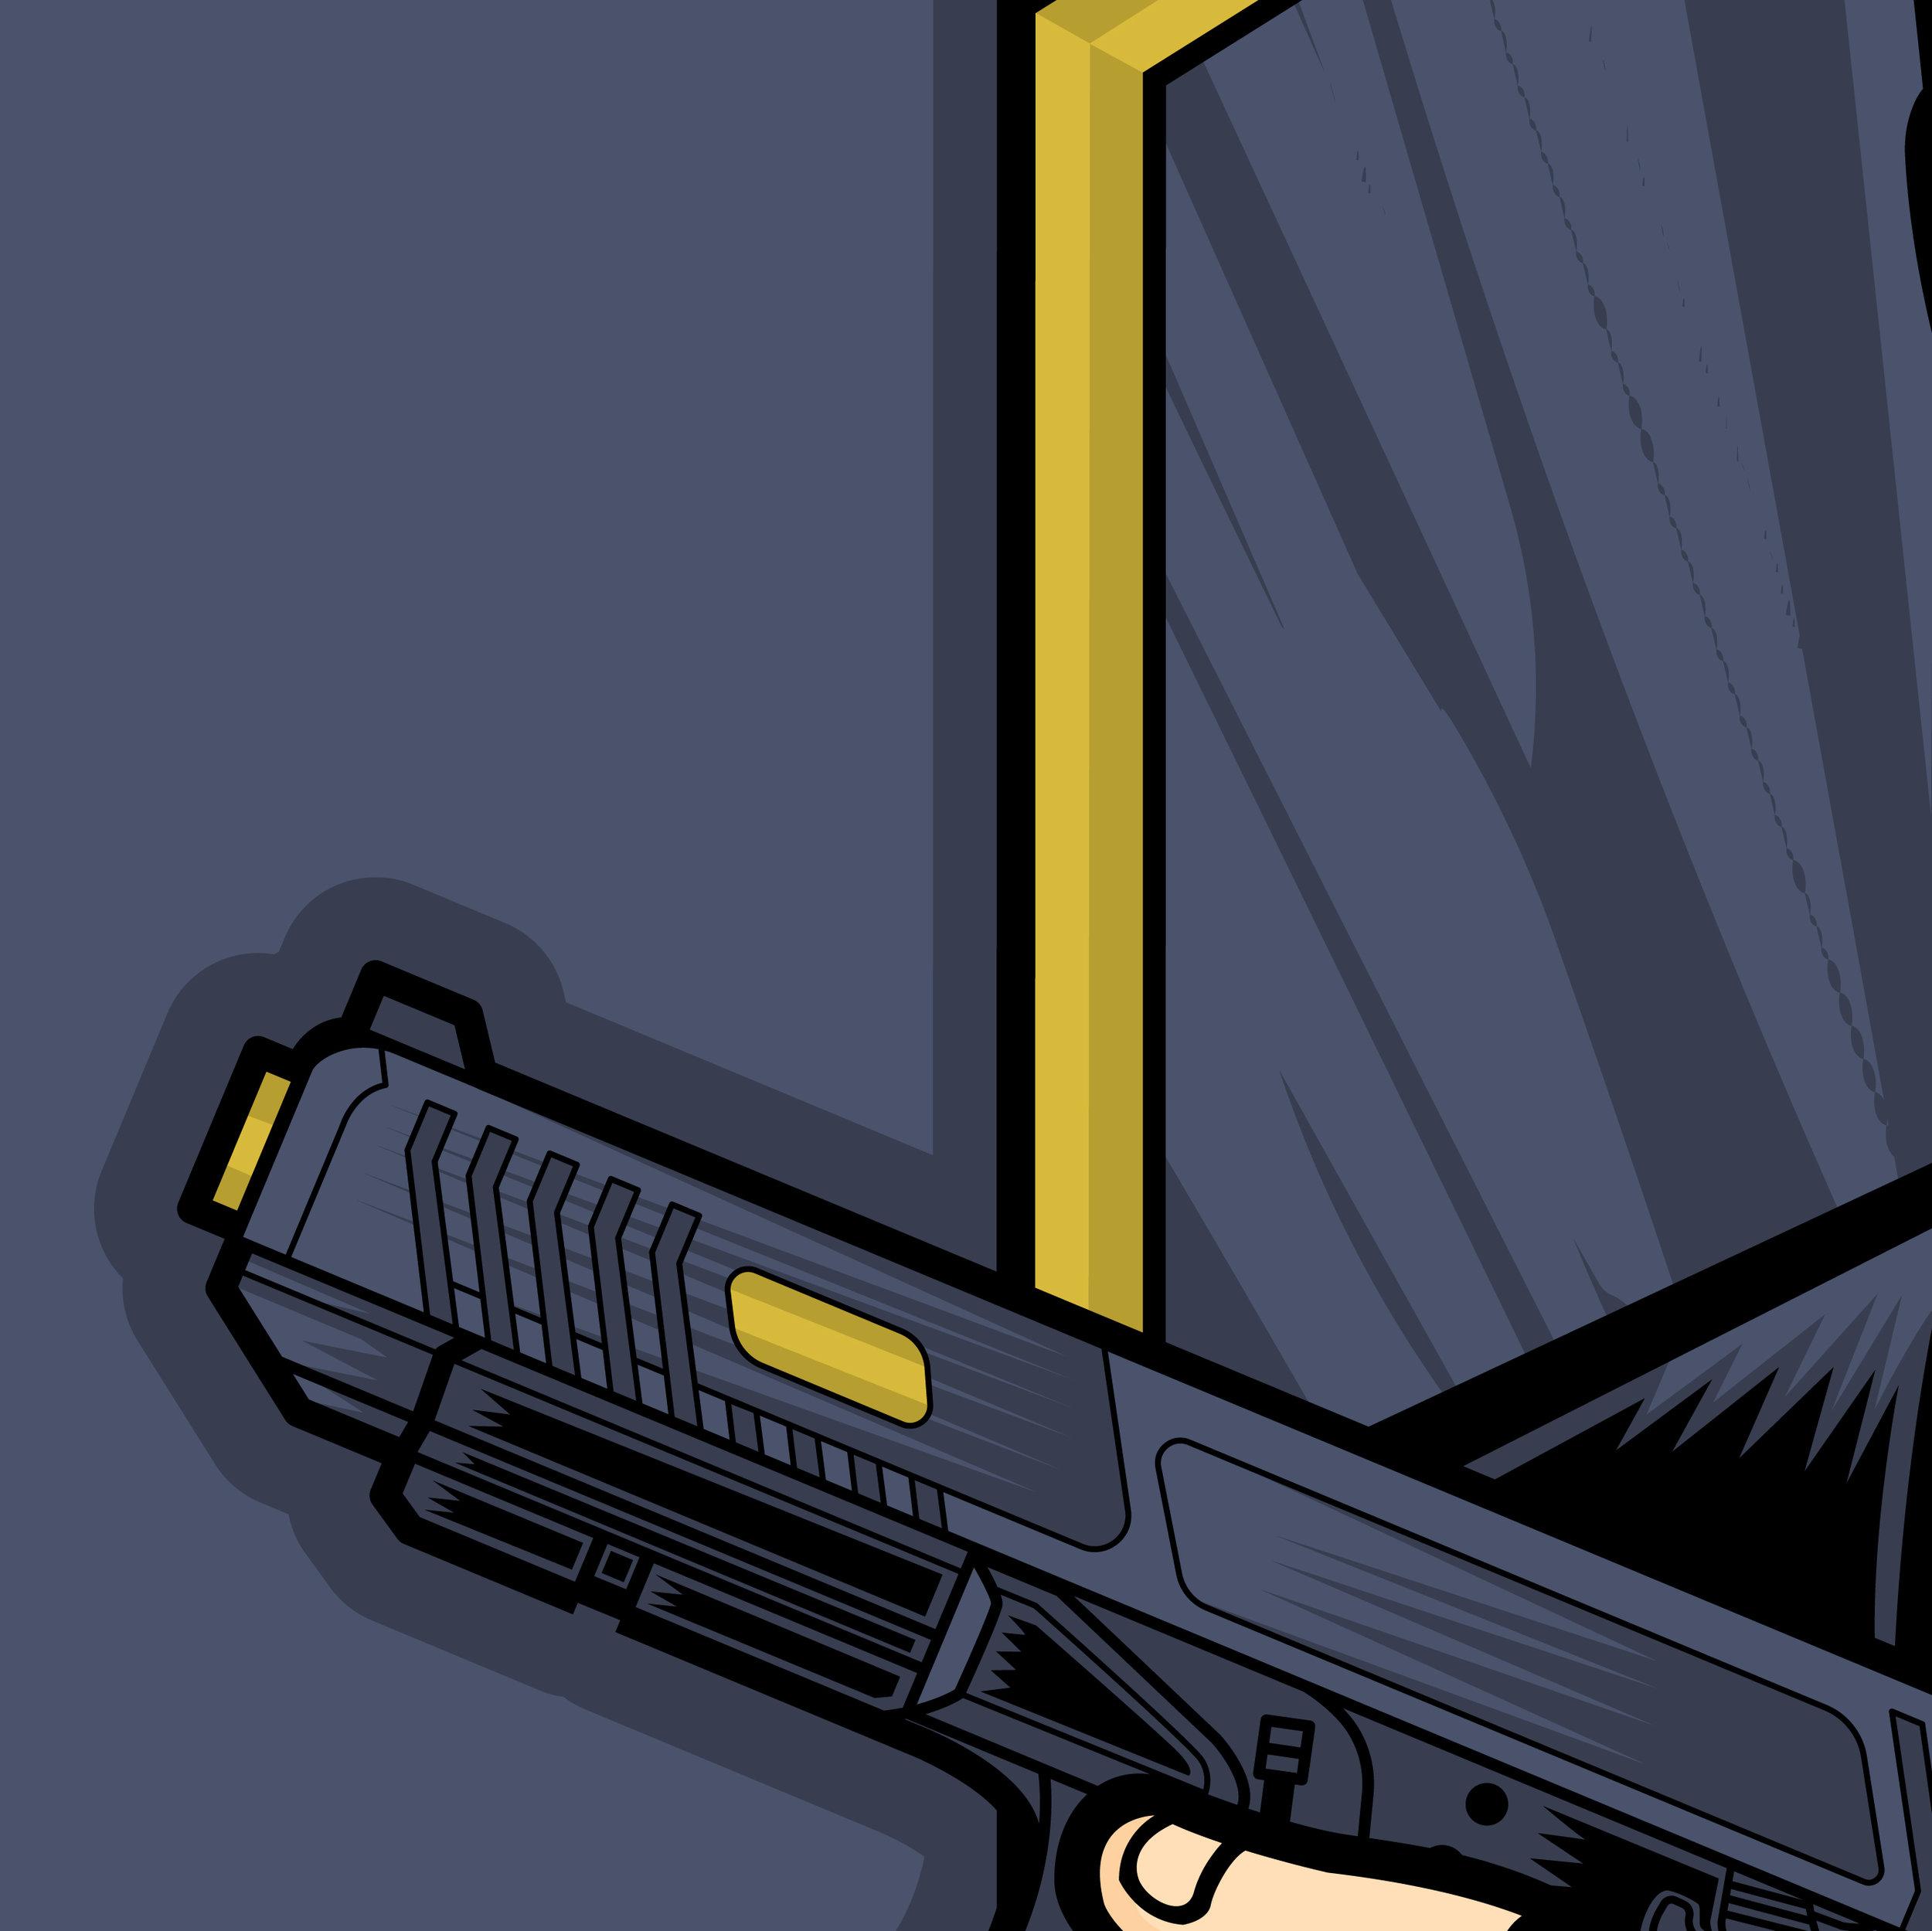 Defcon-Propaganda-john-wick-patch-orozcodesign-robertoorozco-illustration-johnwick-vector-poster-design.jpg